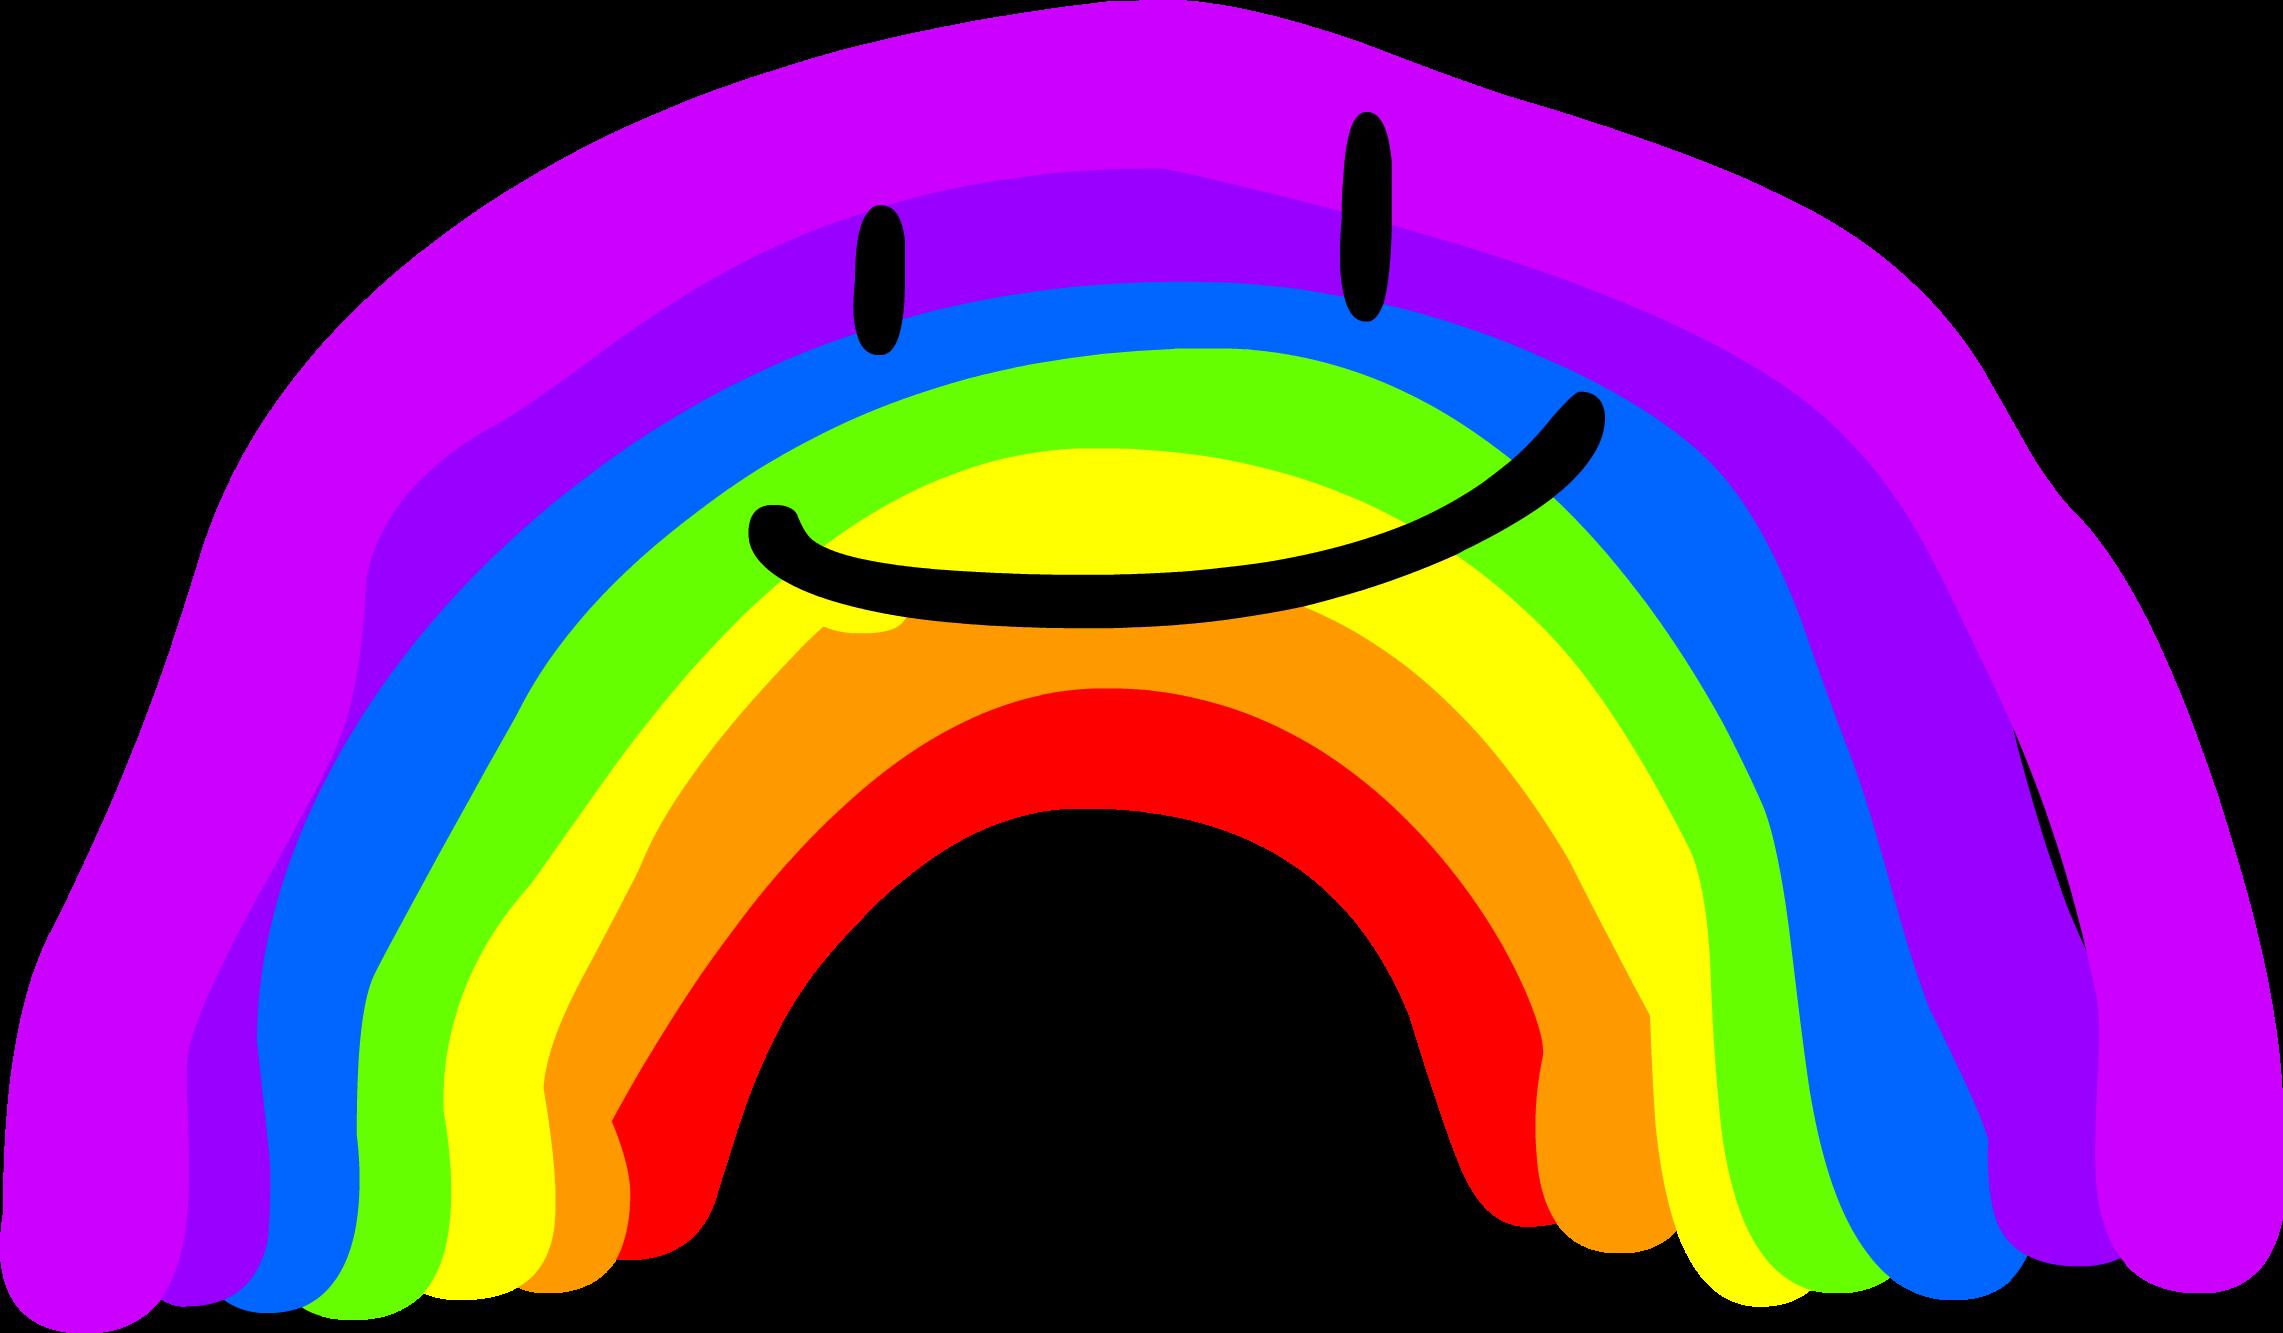 Rainbow BFDI21 23